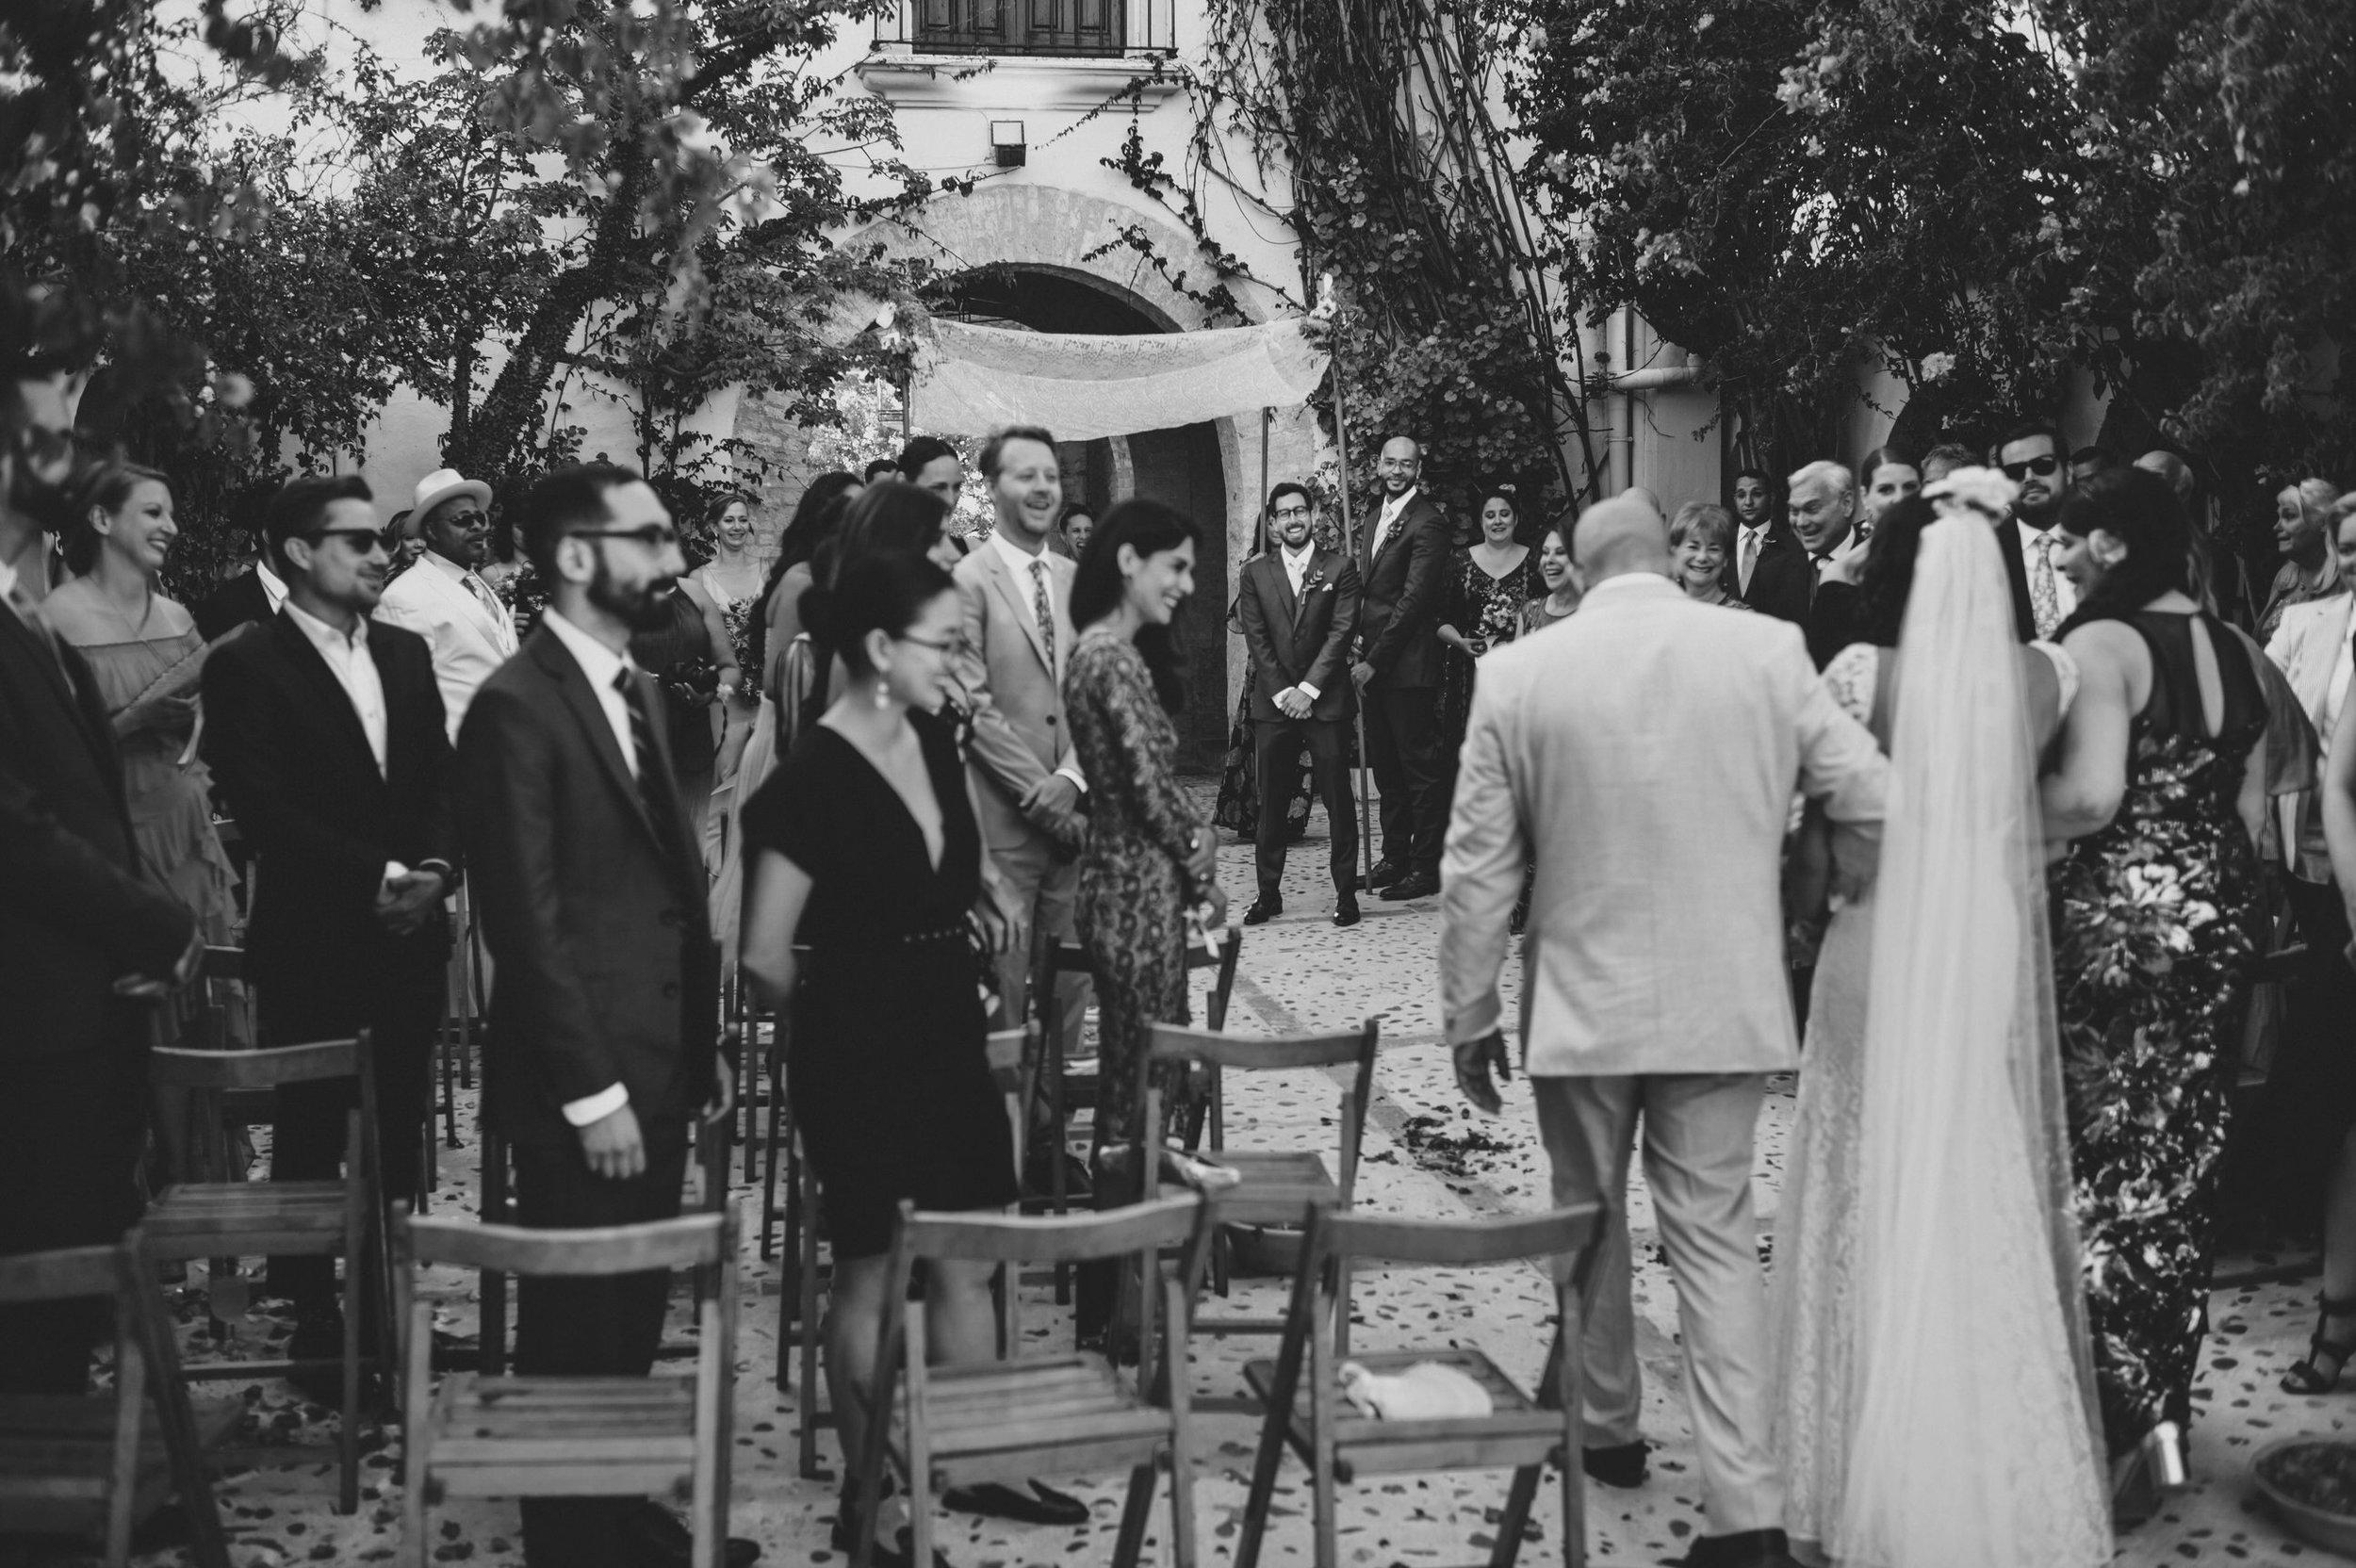 Andres+Amarillo+fotografo+boda+sevilla+natural+sin+poses+hacienda+san+rafael (58).JPG